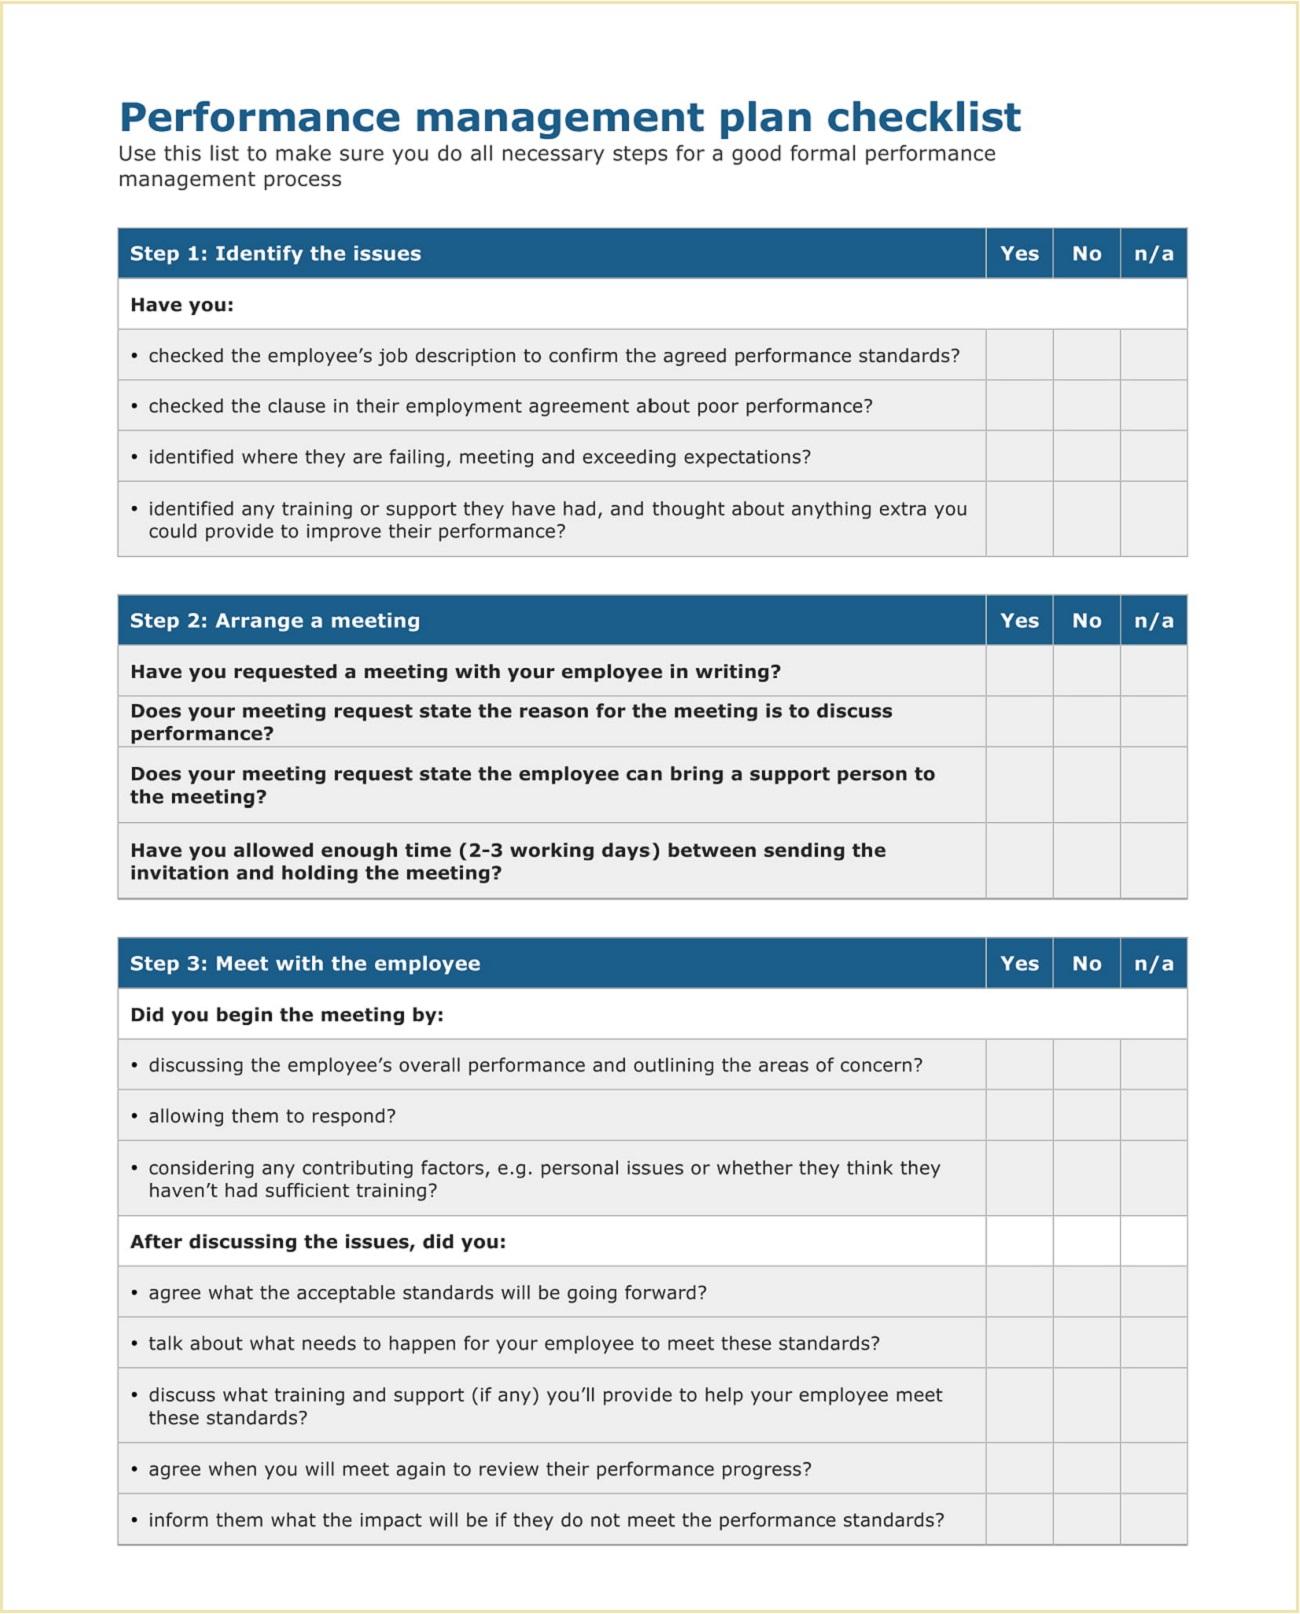 Performance Management Plan Checklist PDF Template